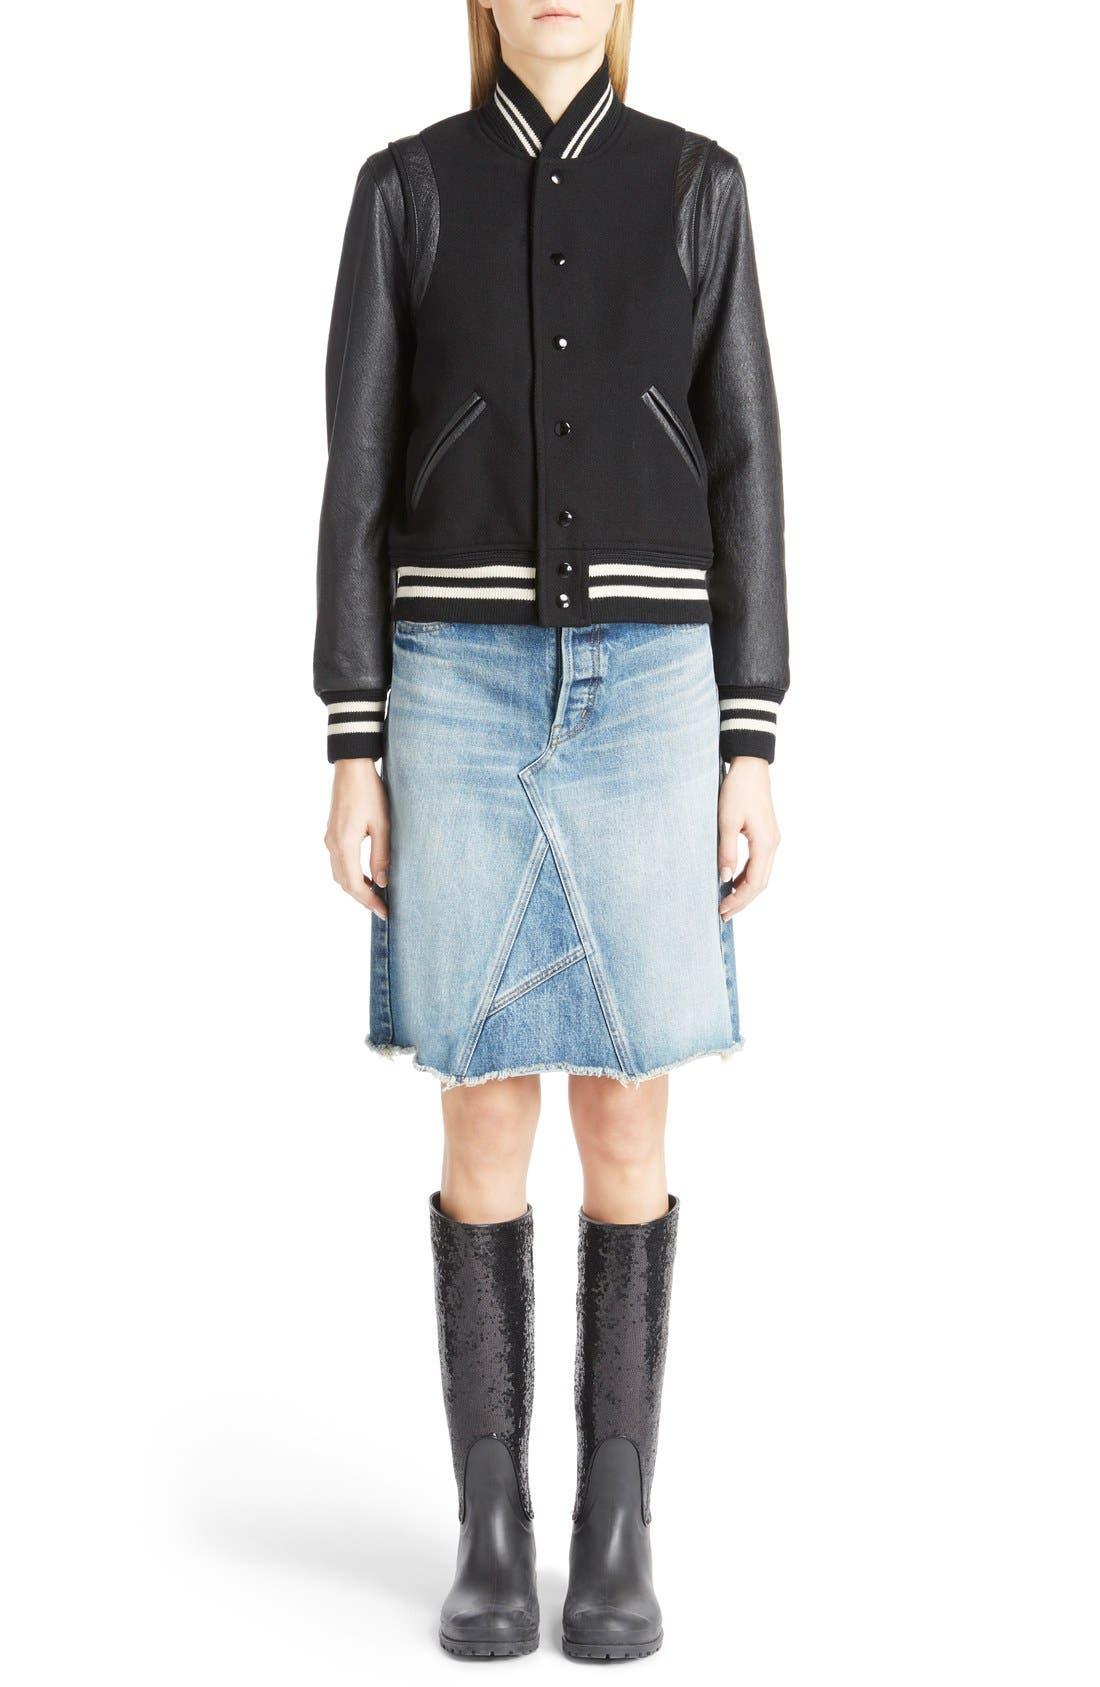 Main Image - Saint Laurent 'Teddy' Full Leather Sleeve Bomber Jacket